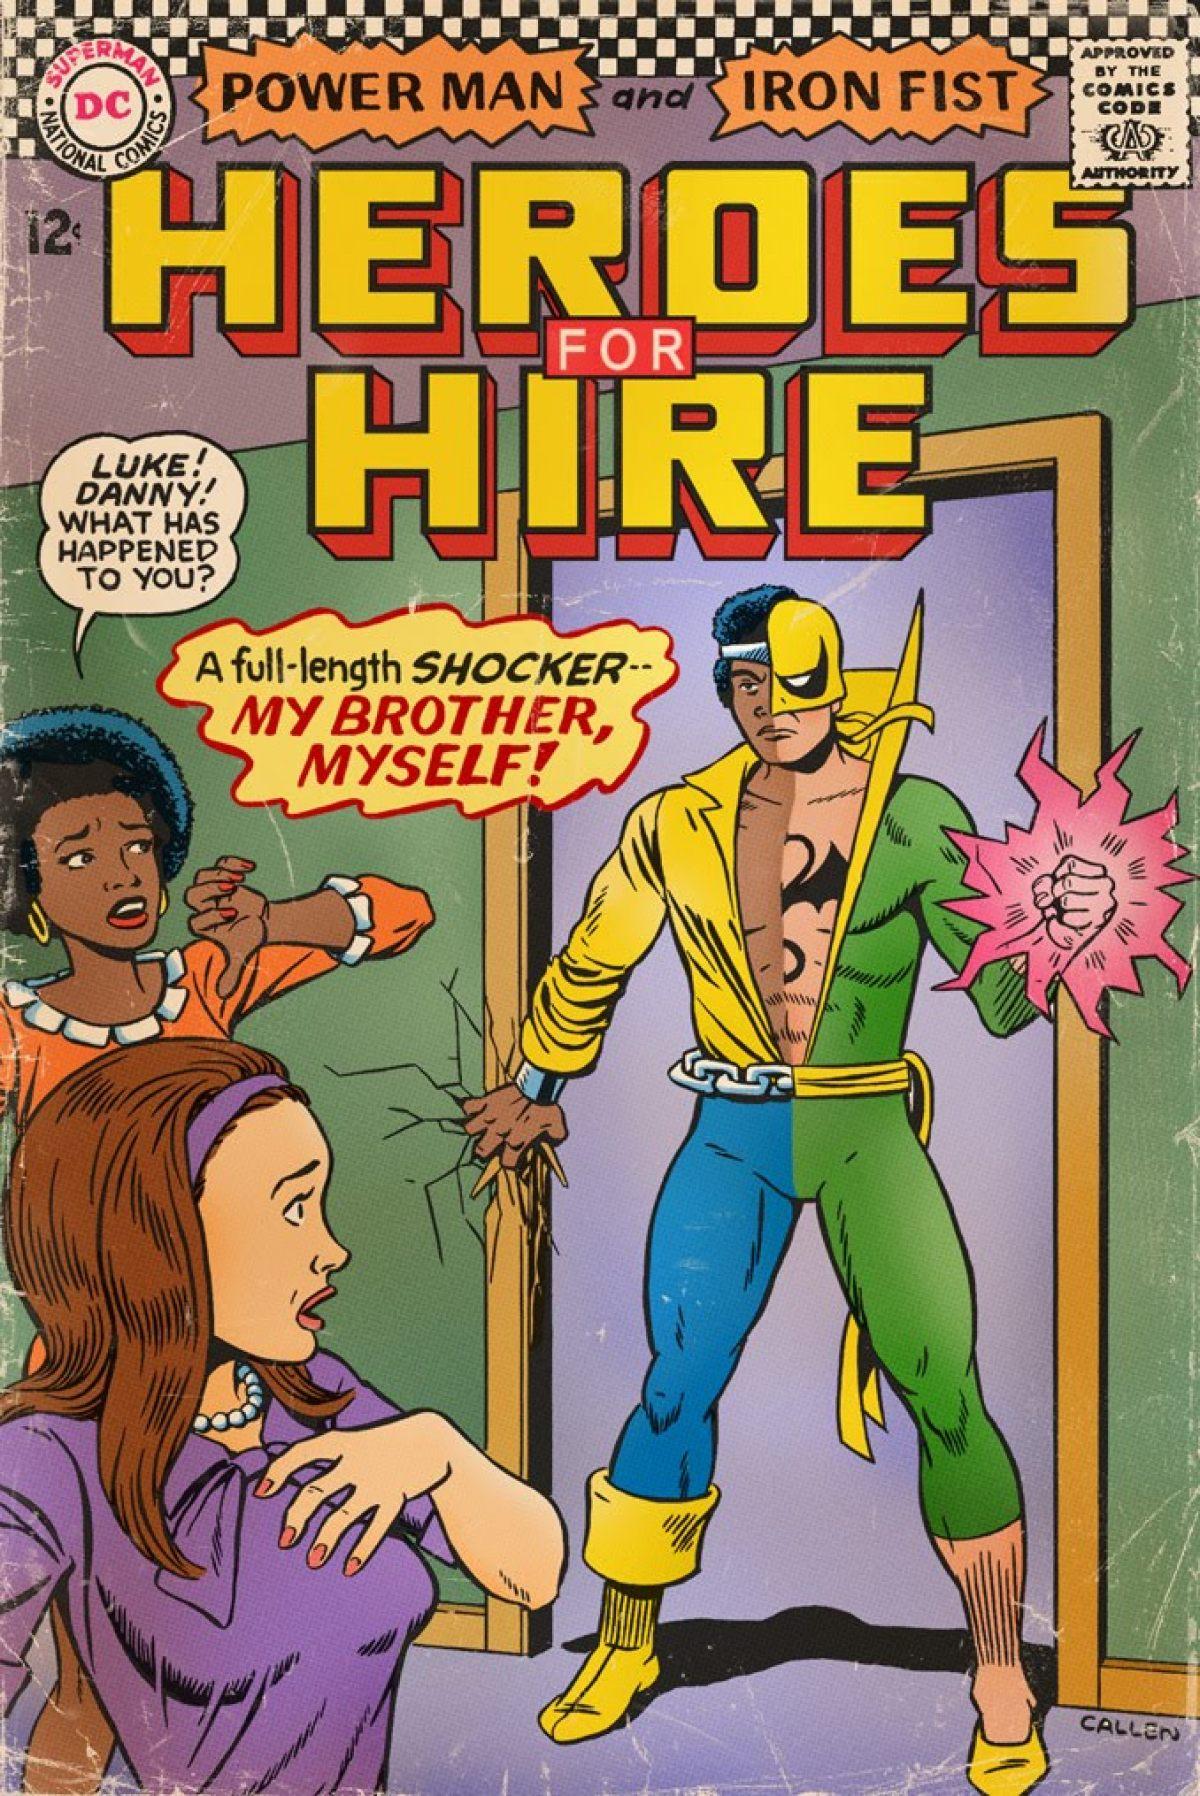 What If 60s/70s Marvel Comics Had DC Comics Covers